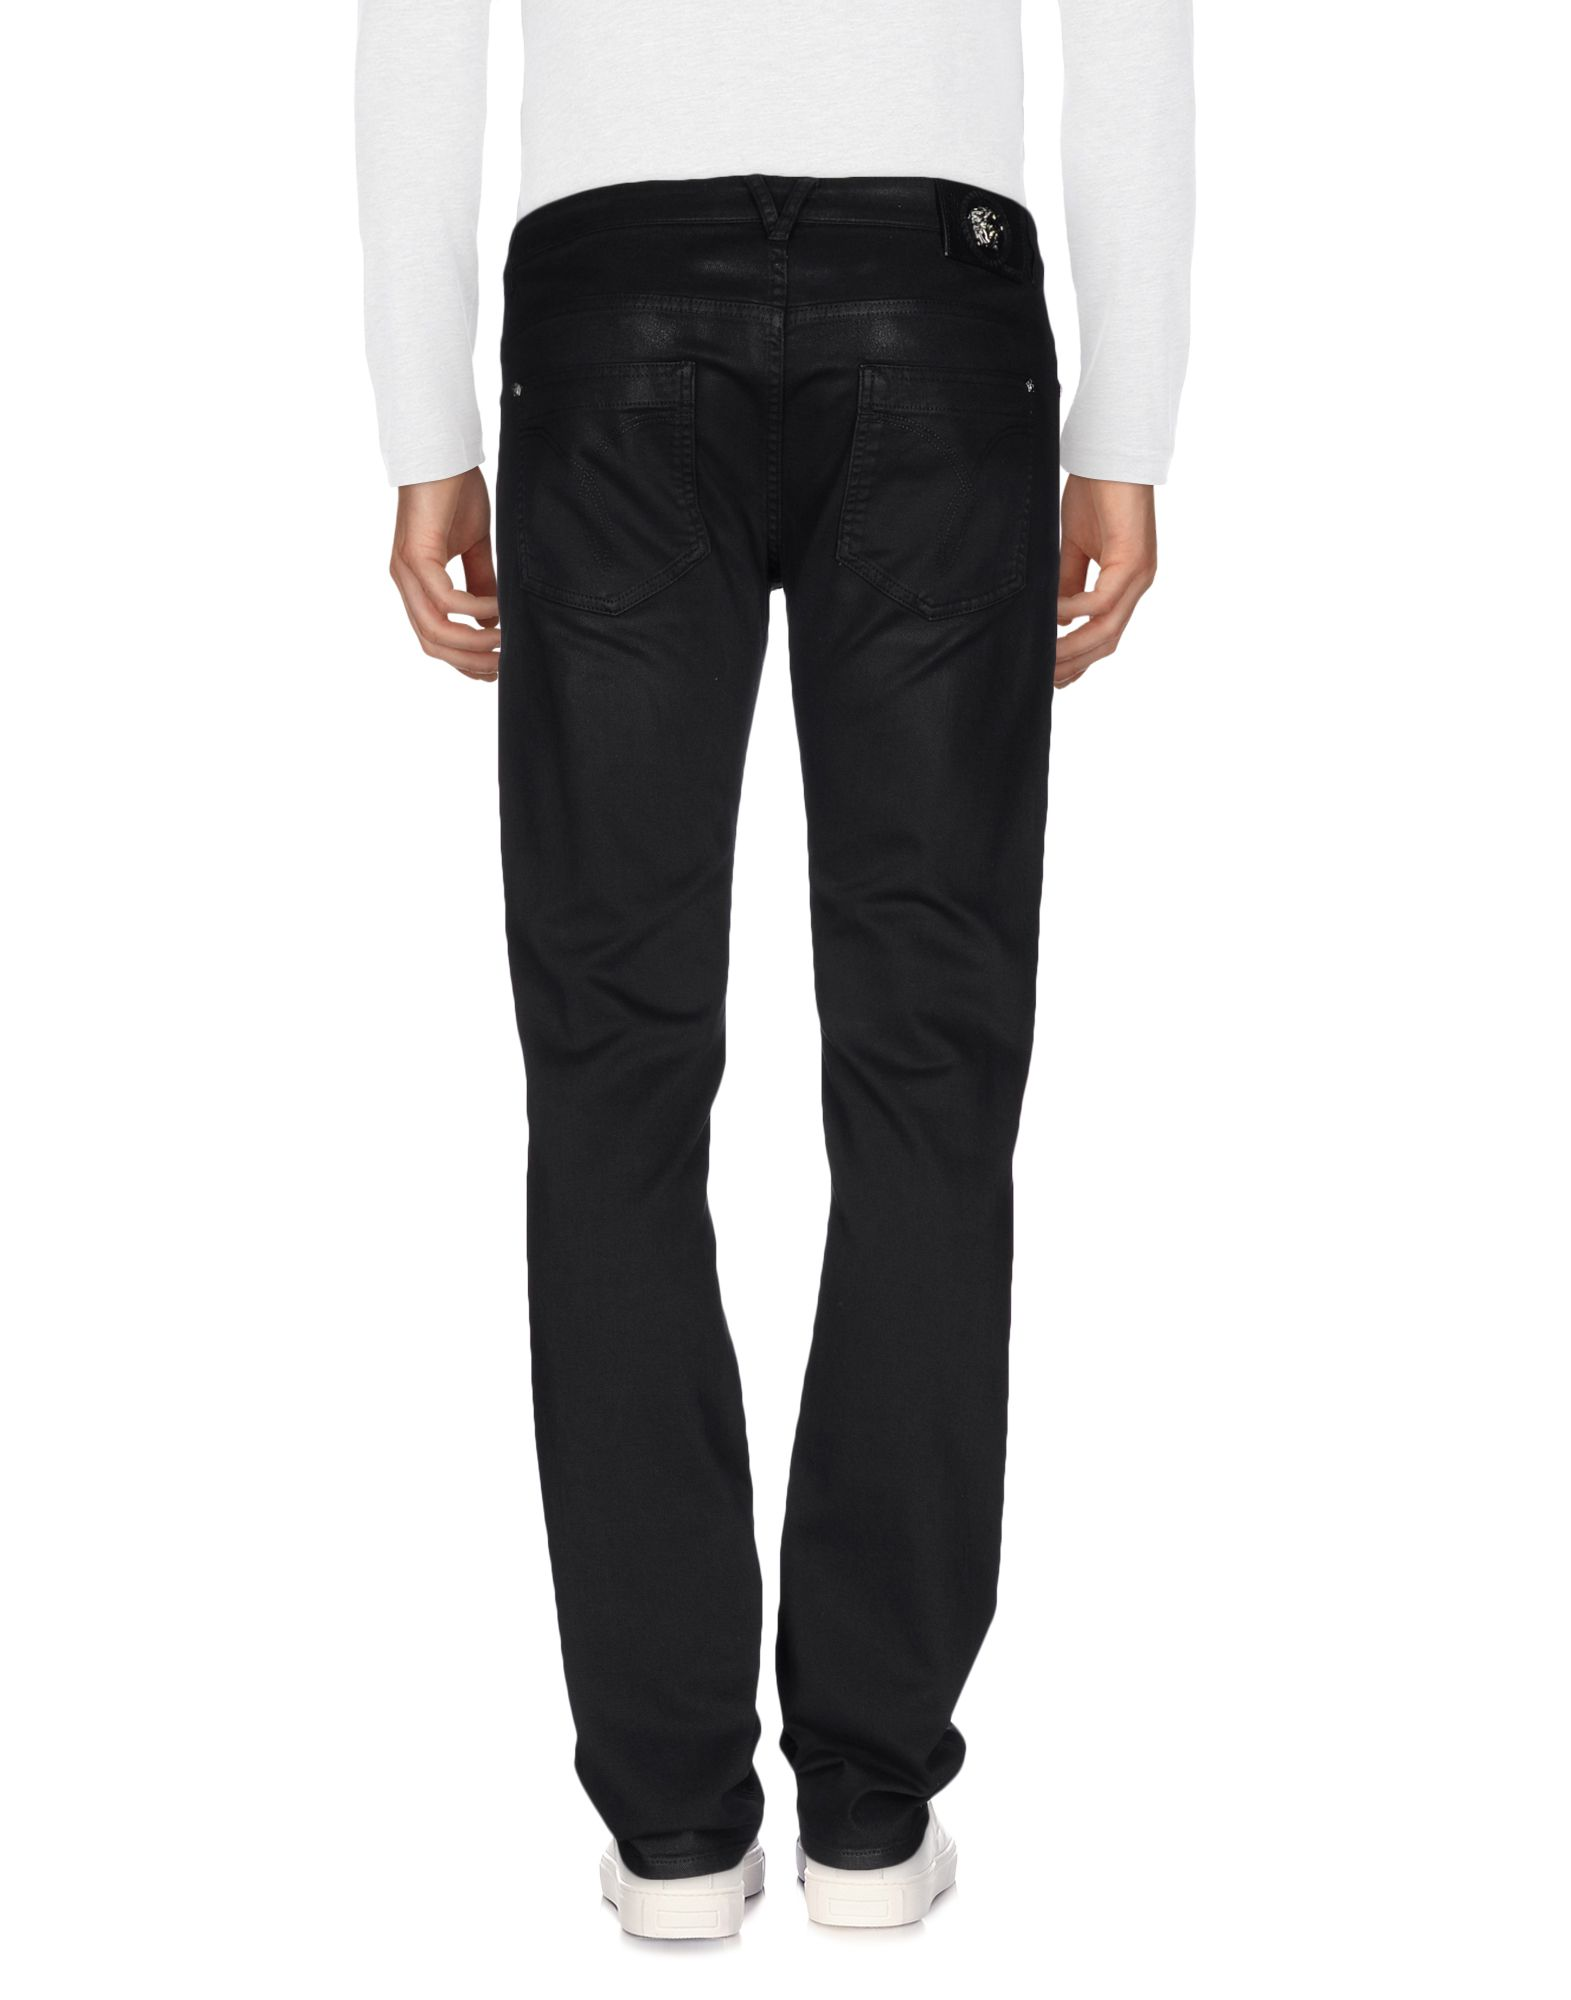 Pantaloni Versace Jeans Versace Pantaloni Uomo - 42536499XE 26475e